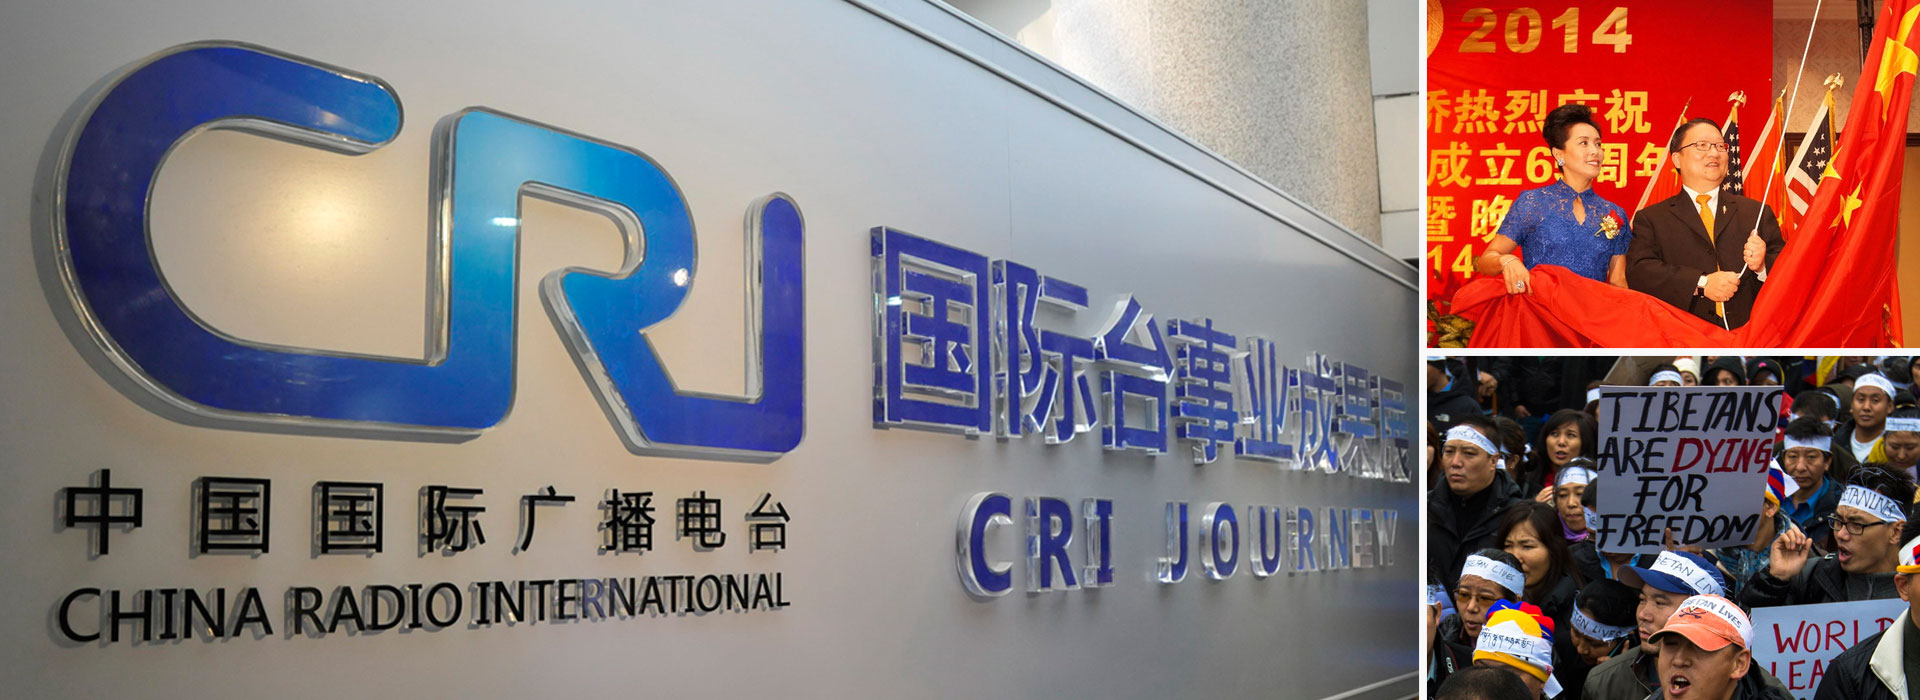 Beijing's Covert Global Radio Network